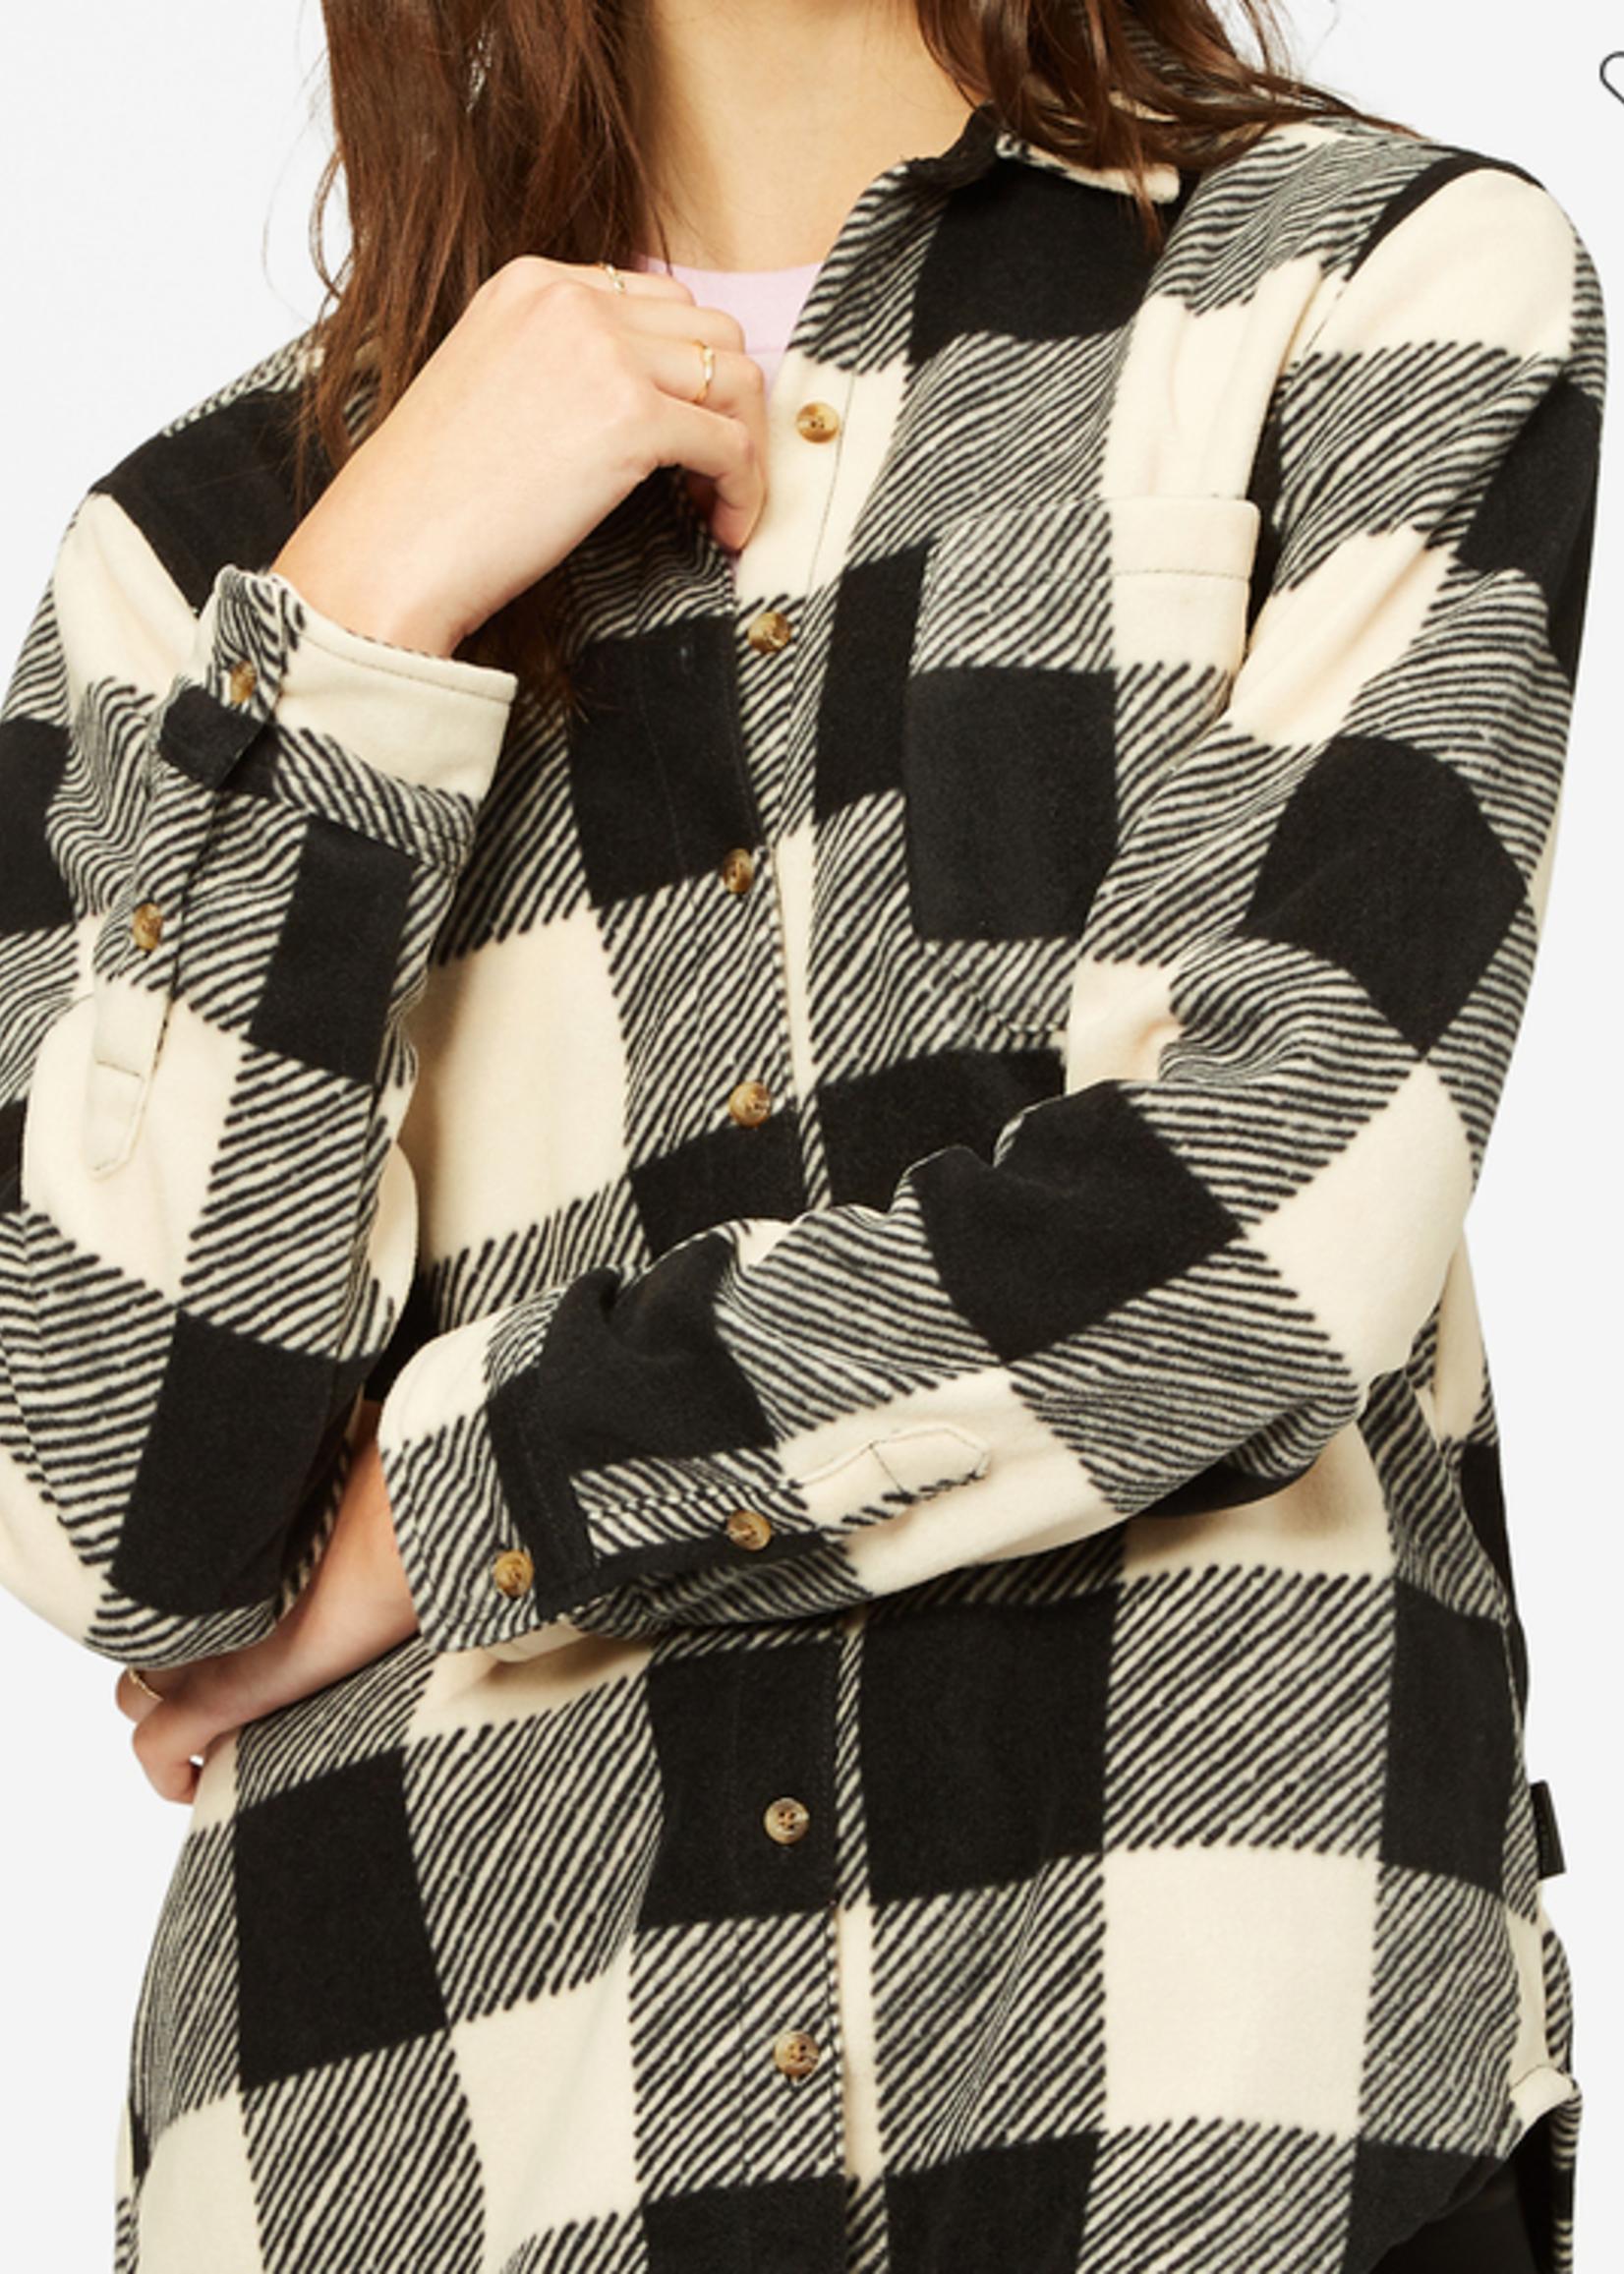 Billabong Forge Flannel Fleece - White/Black